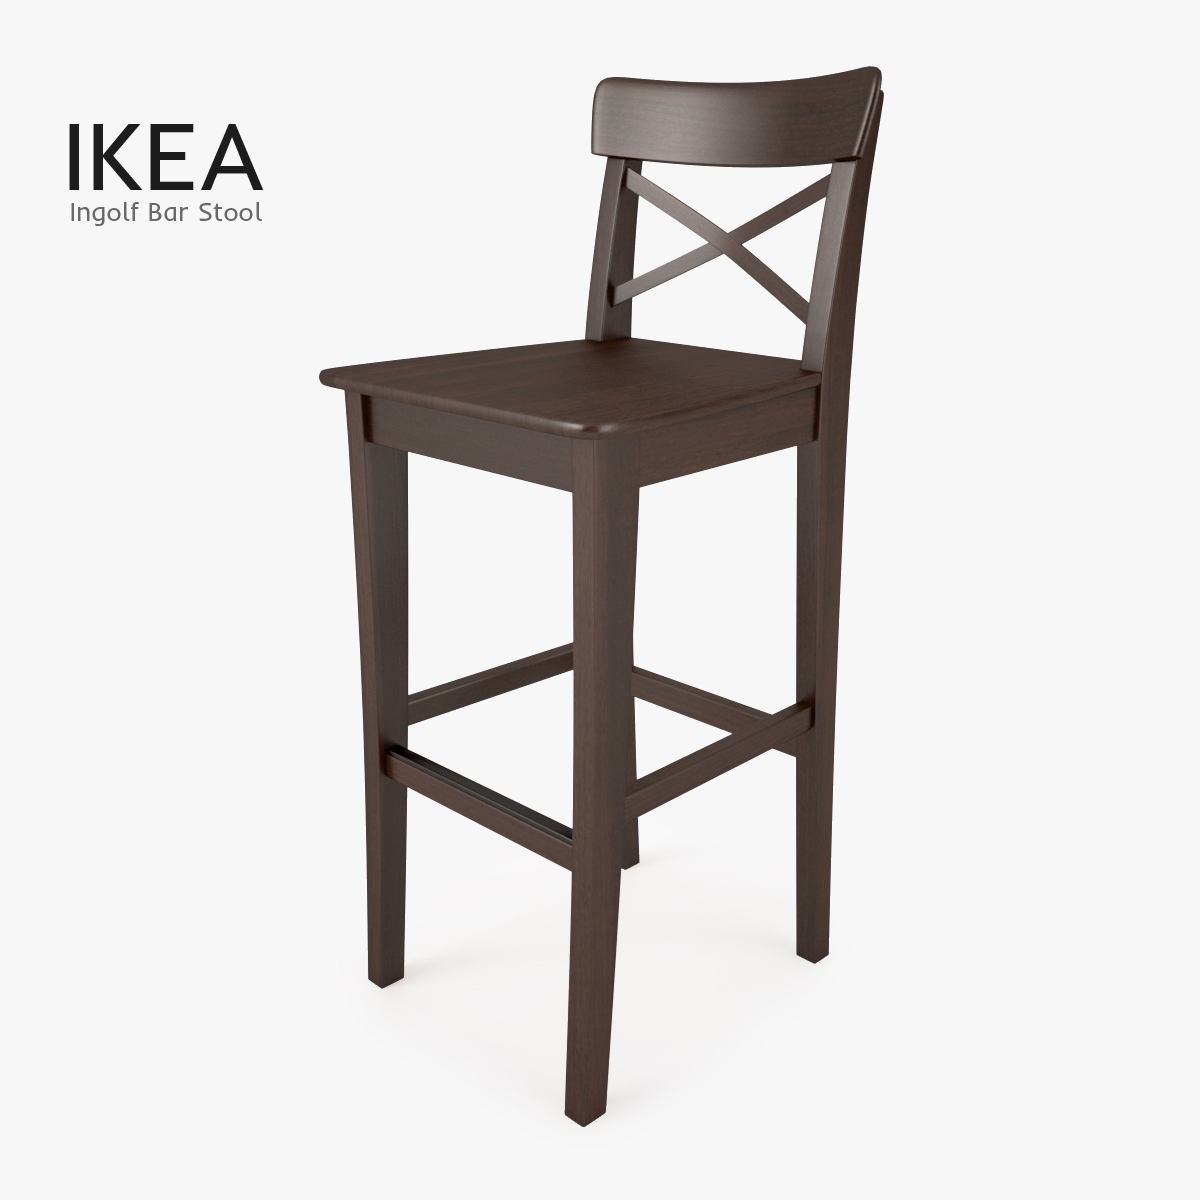 Groovy Ikea Ingolf Bar Stool Andrewgaddart Wooden Chair Designs For Living Room Andrewgaddartcom